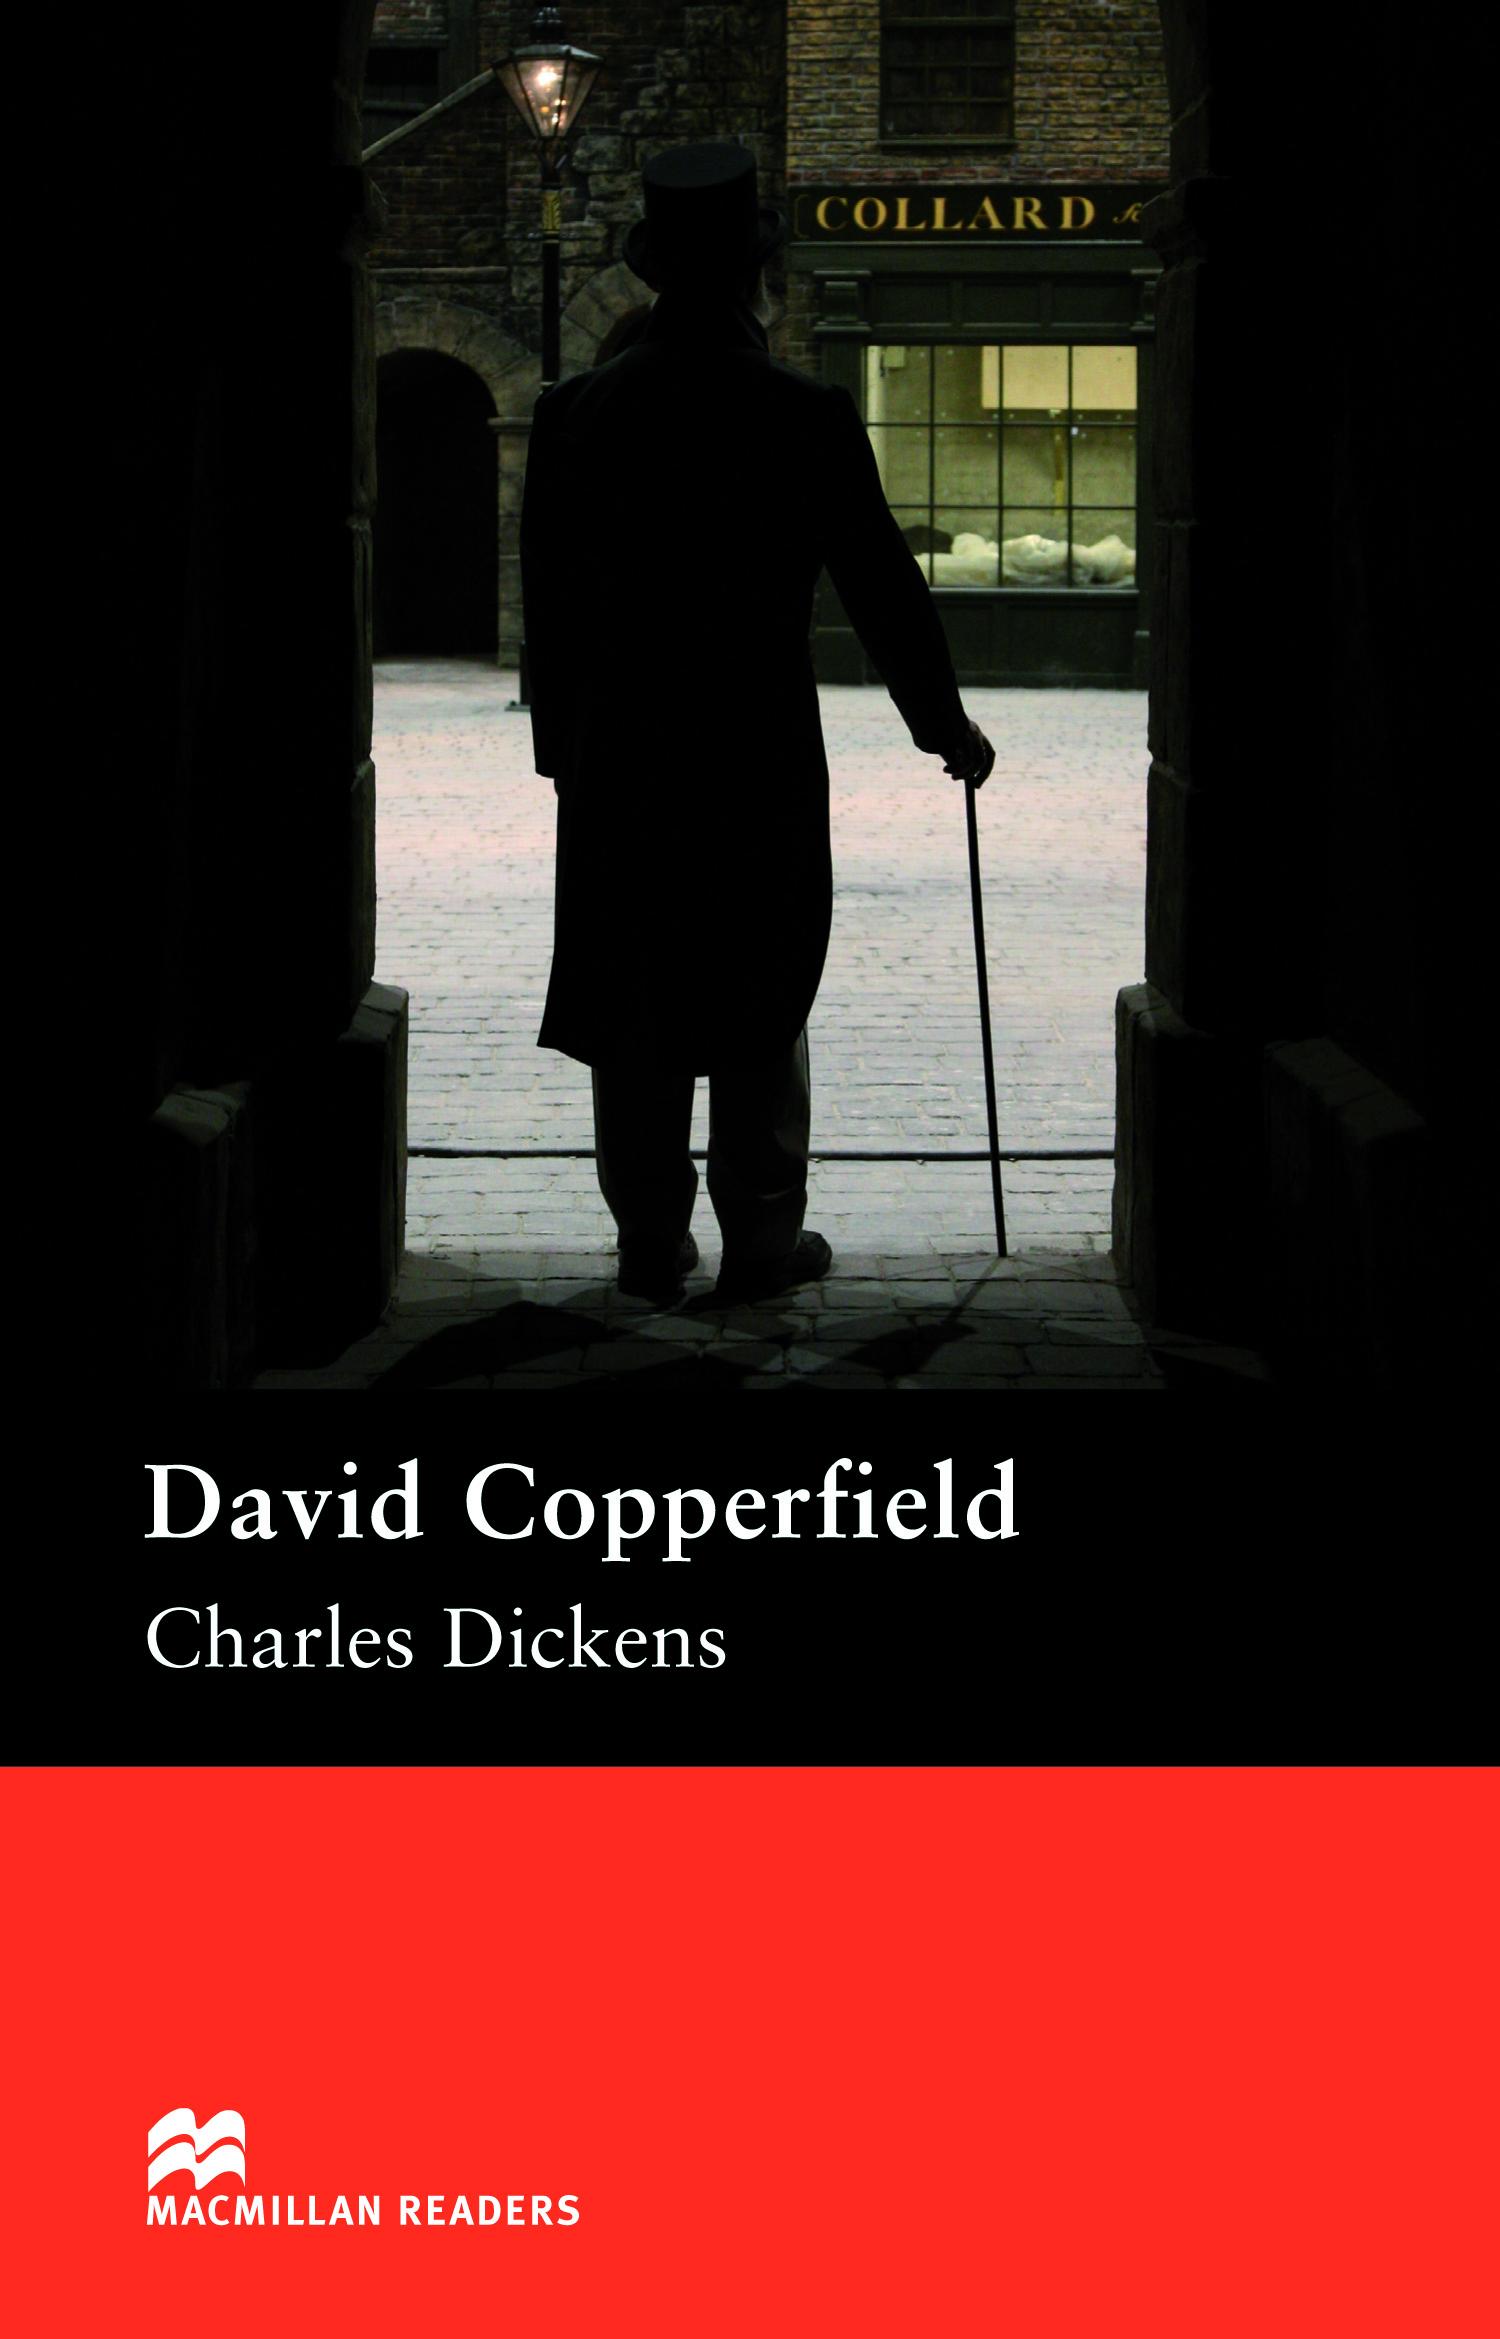 Macmillan Readers: David Copperfield